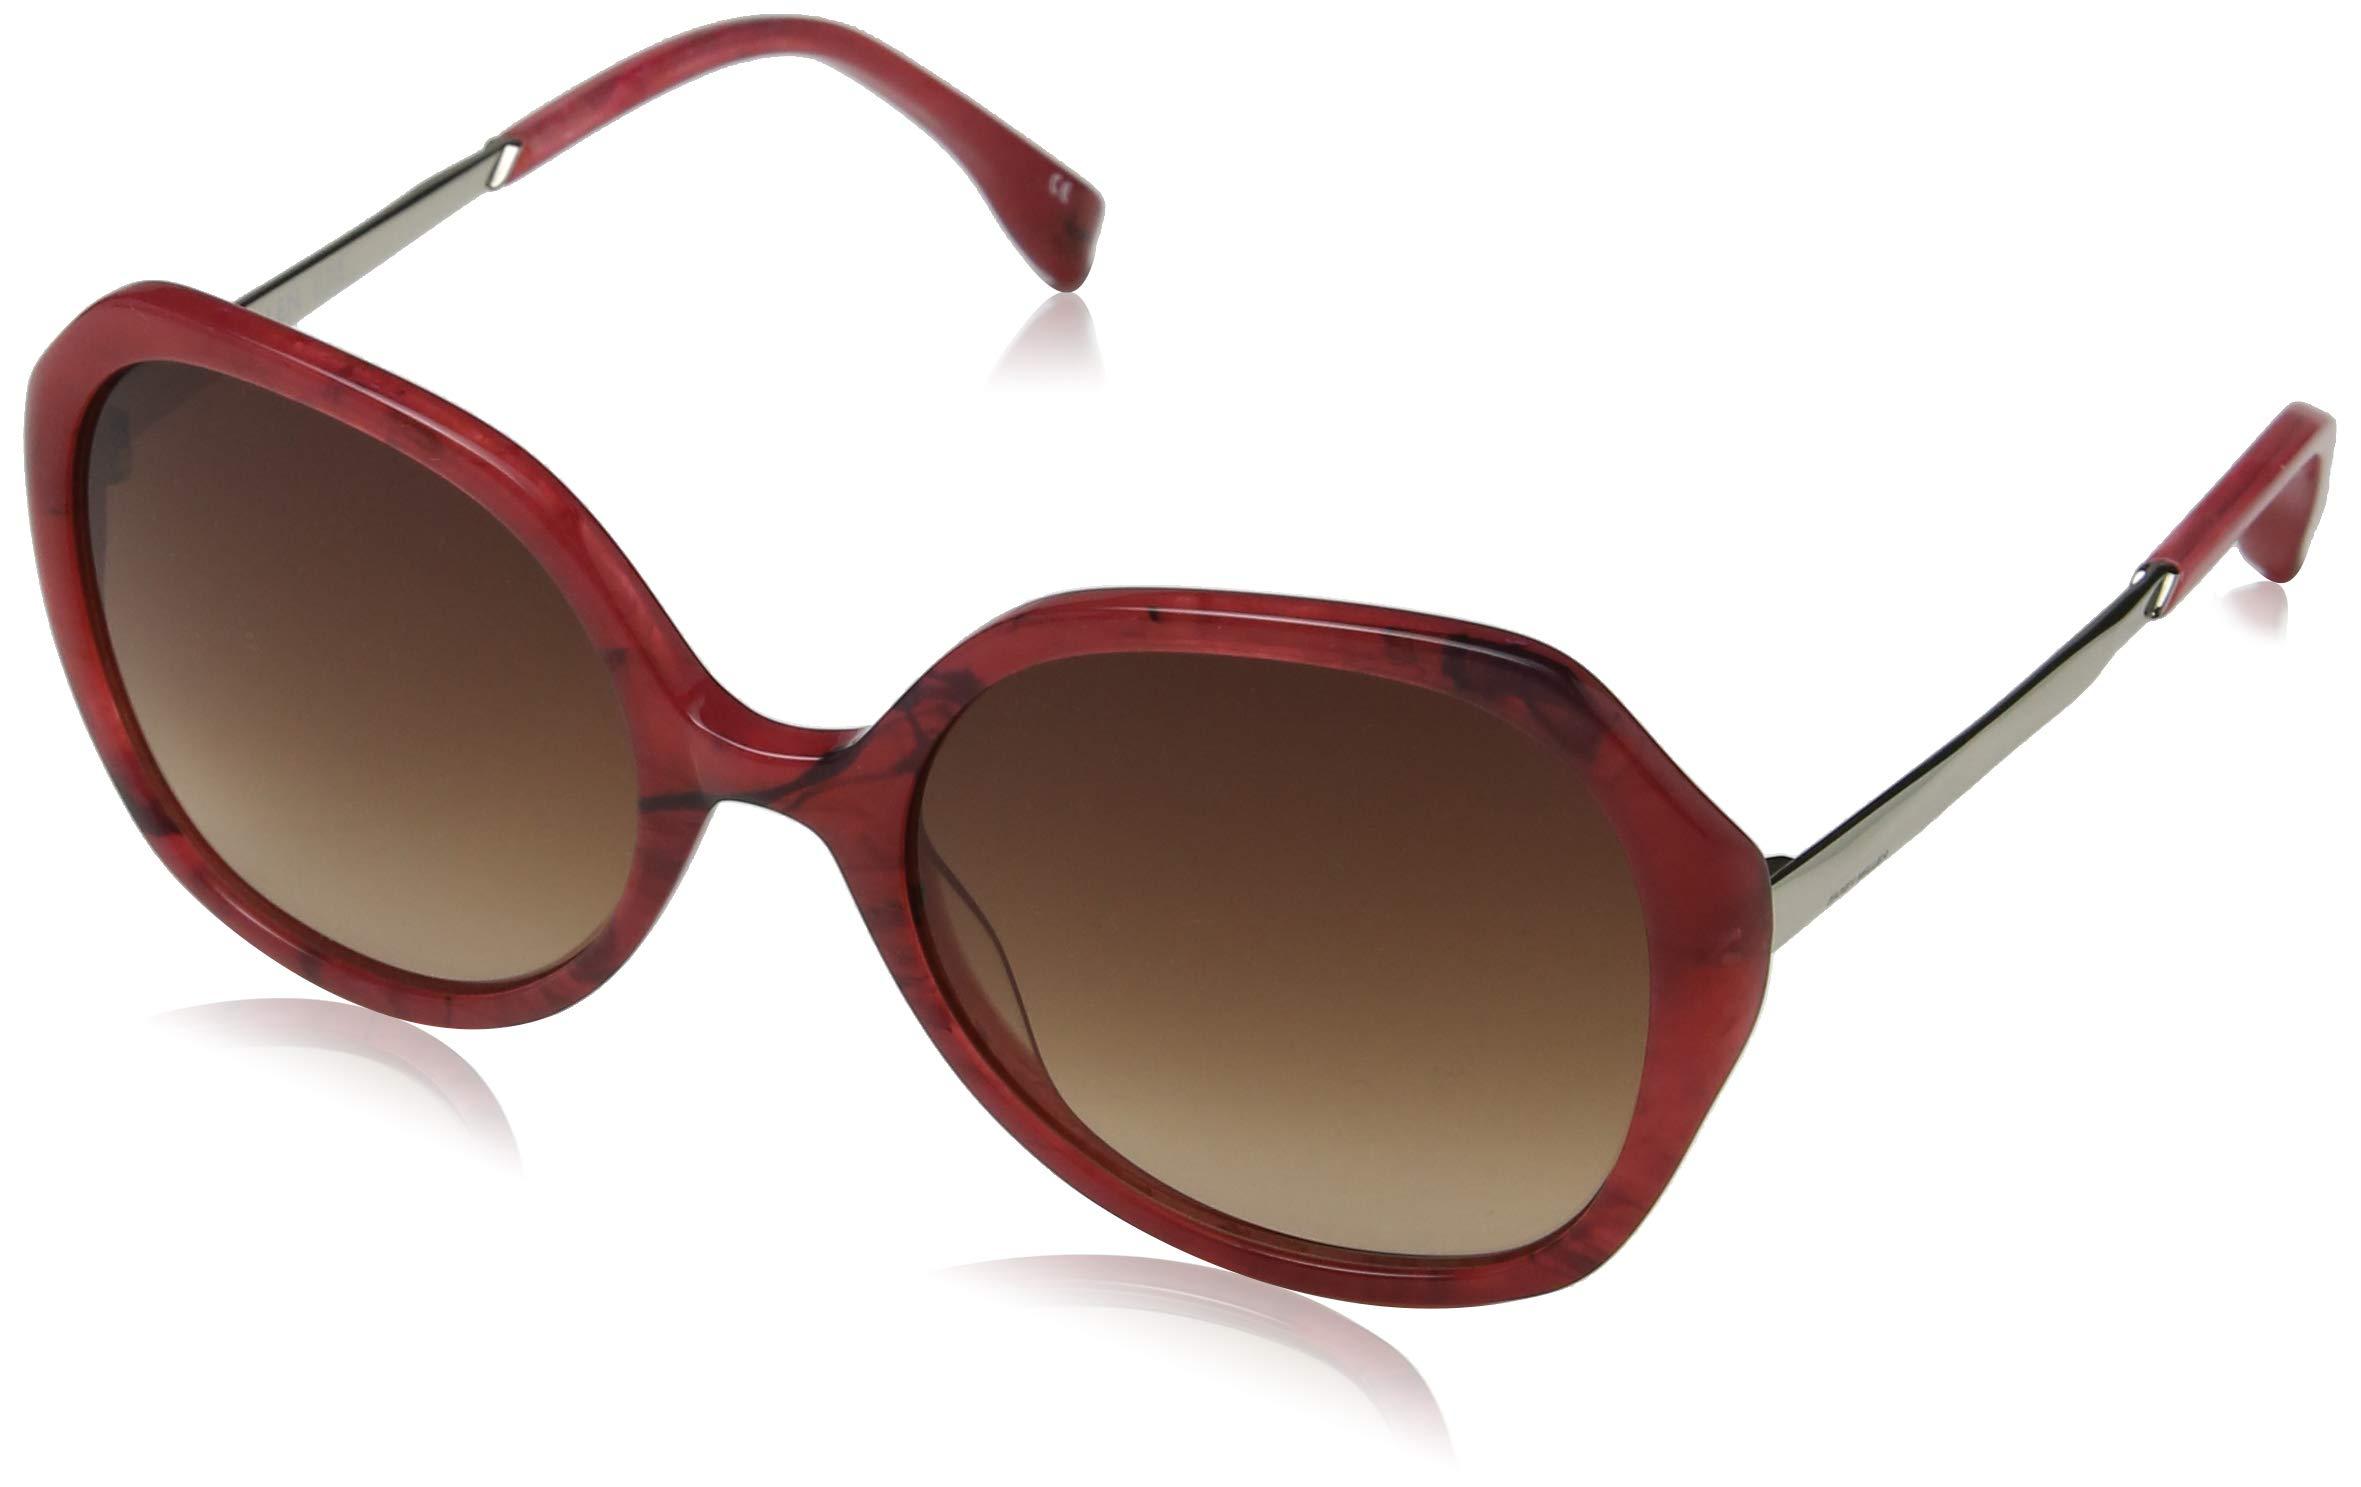 Montures Karen Luxe Millen De Femme Sunglasses 0 LunettesRougered55 gvbf6yIY7